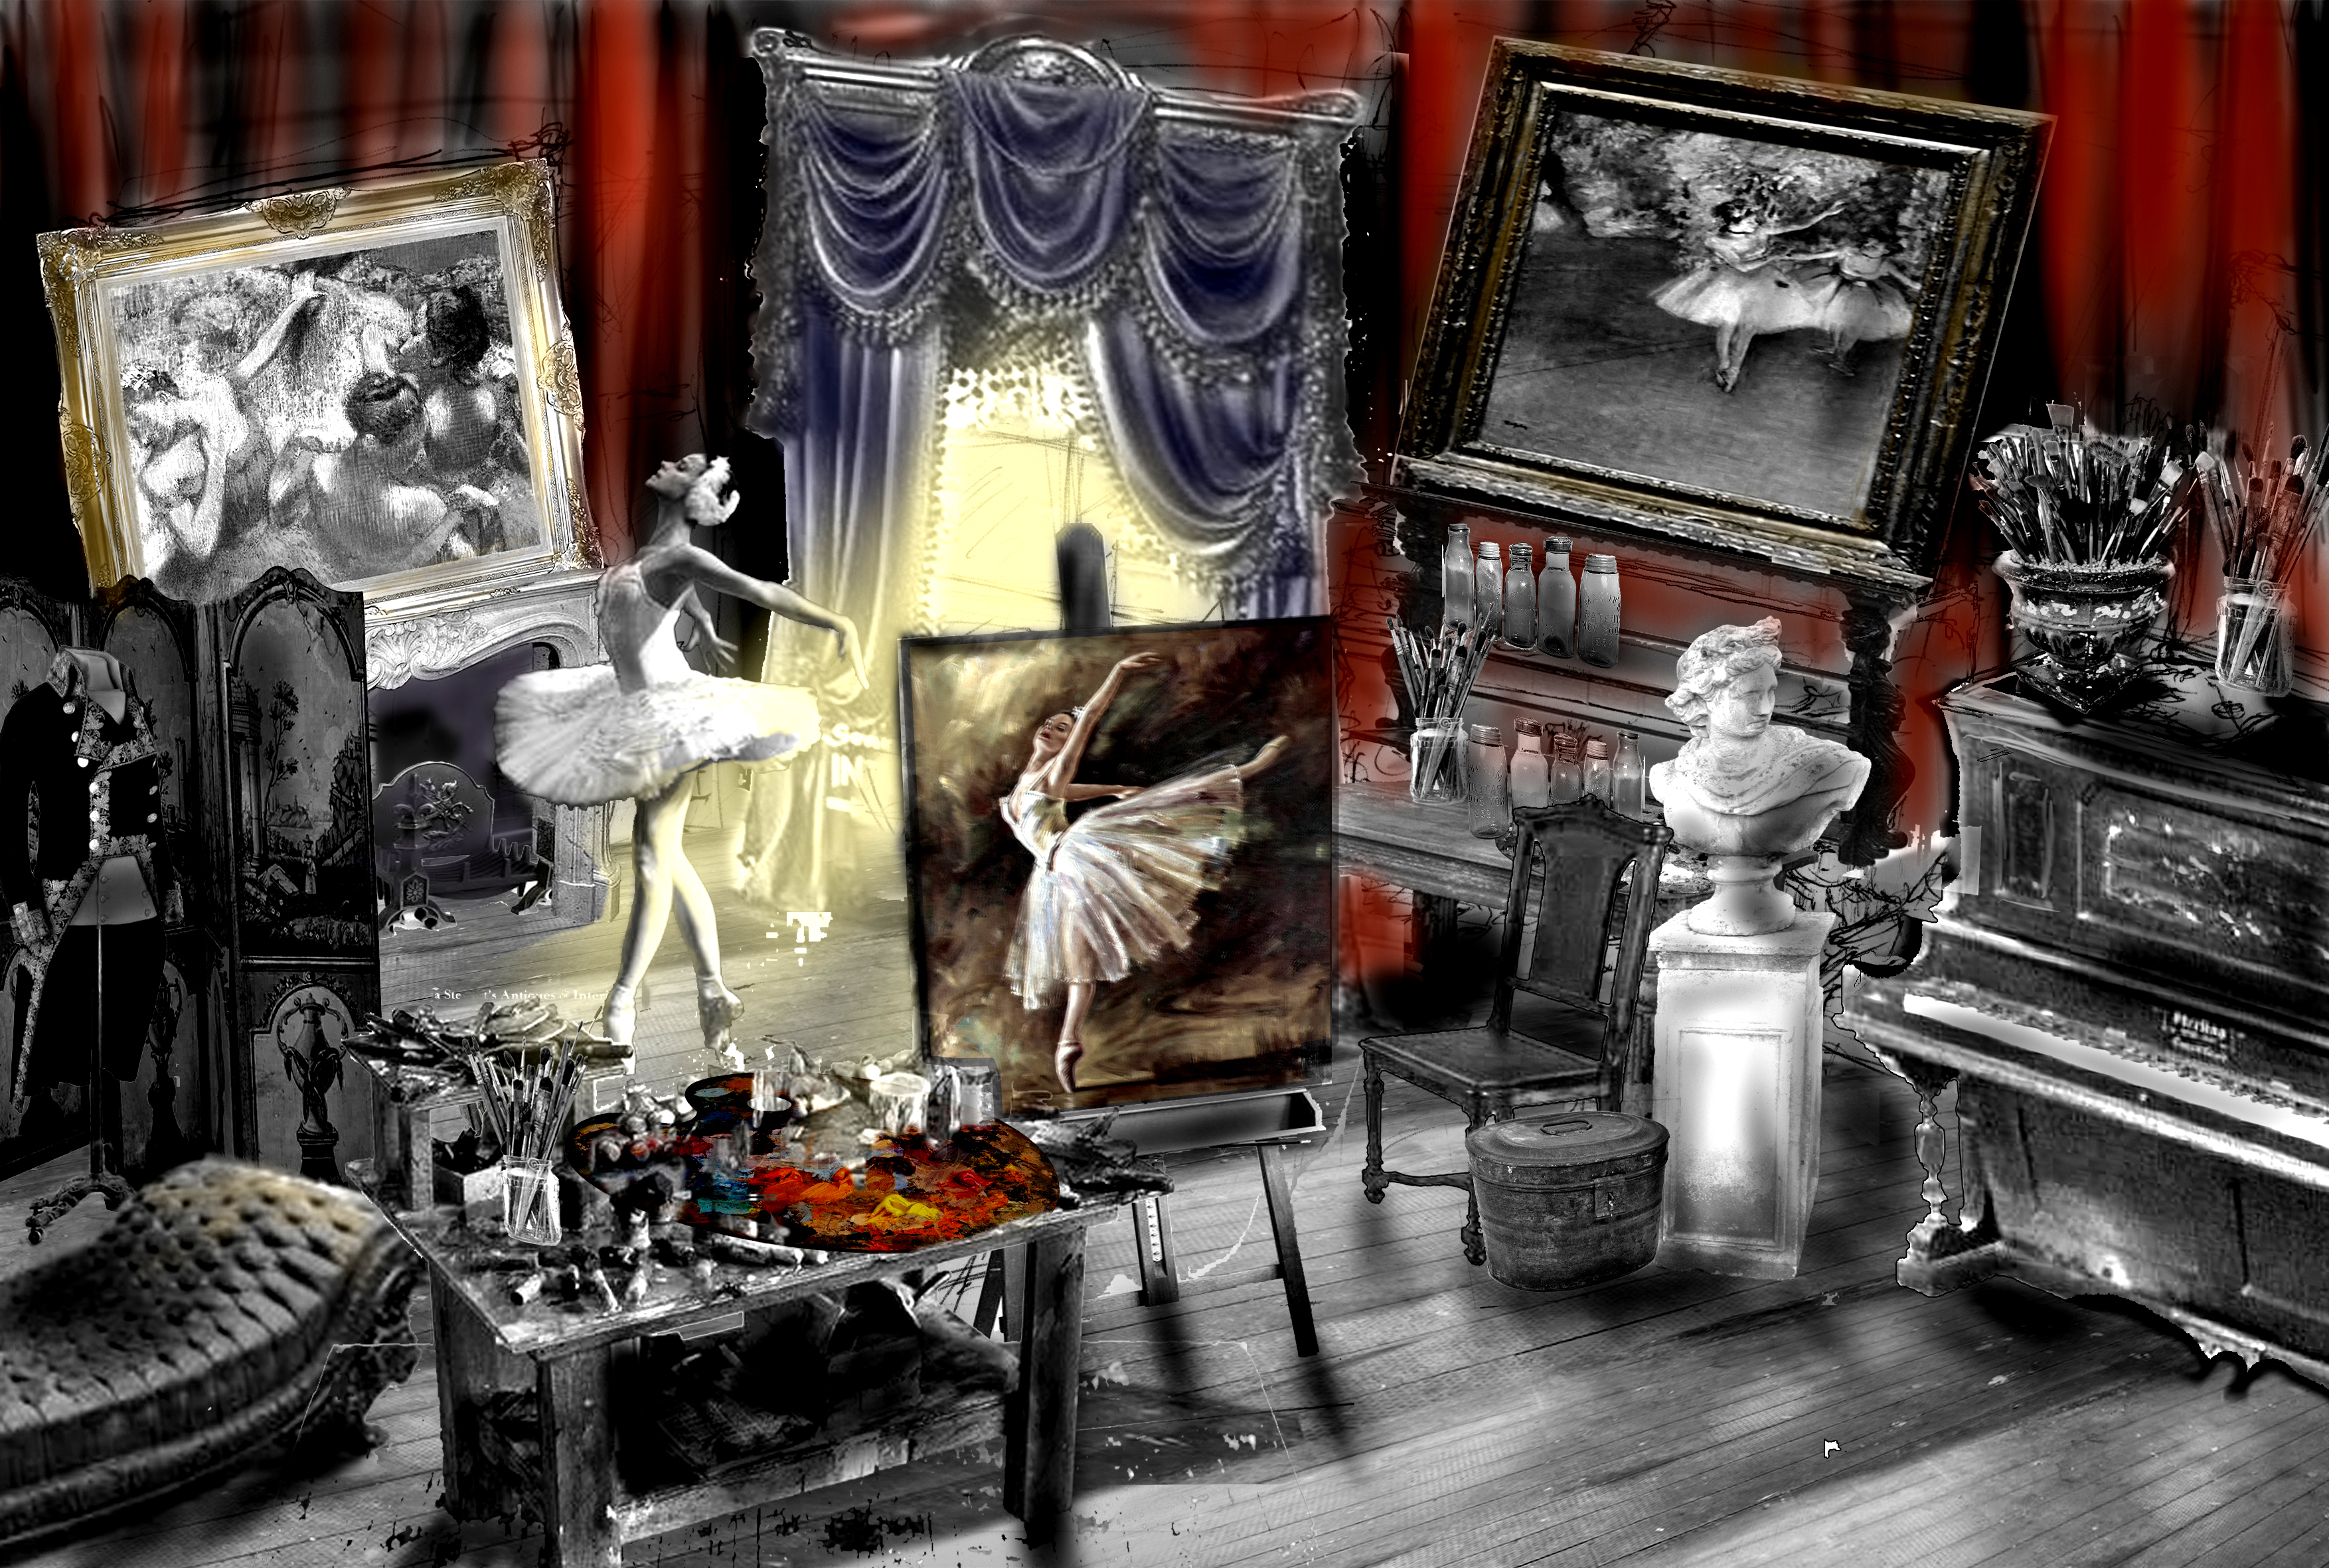 The Impressionists Degas Studio